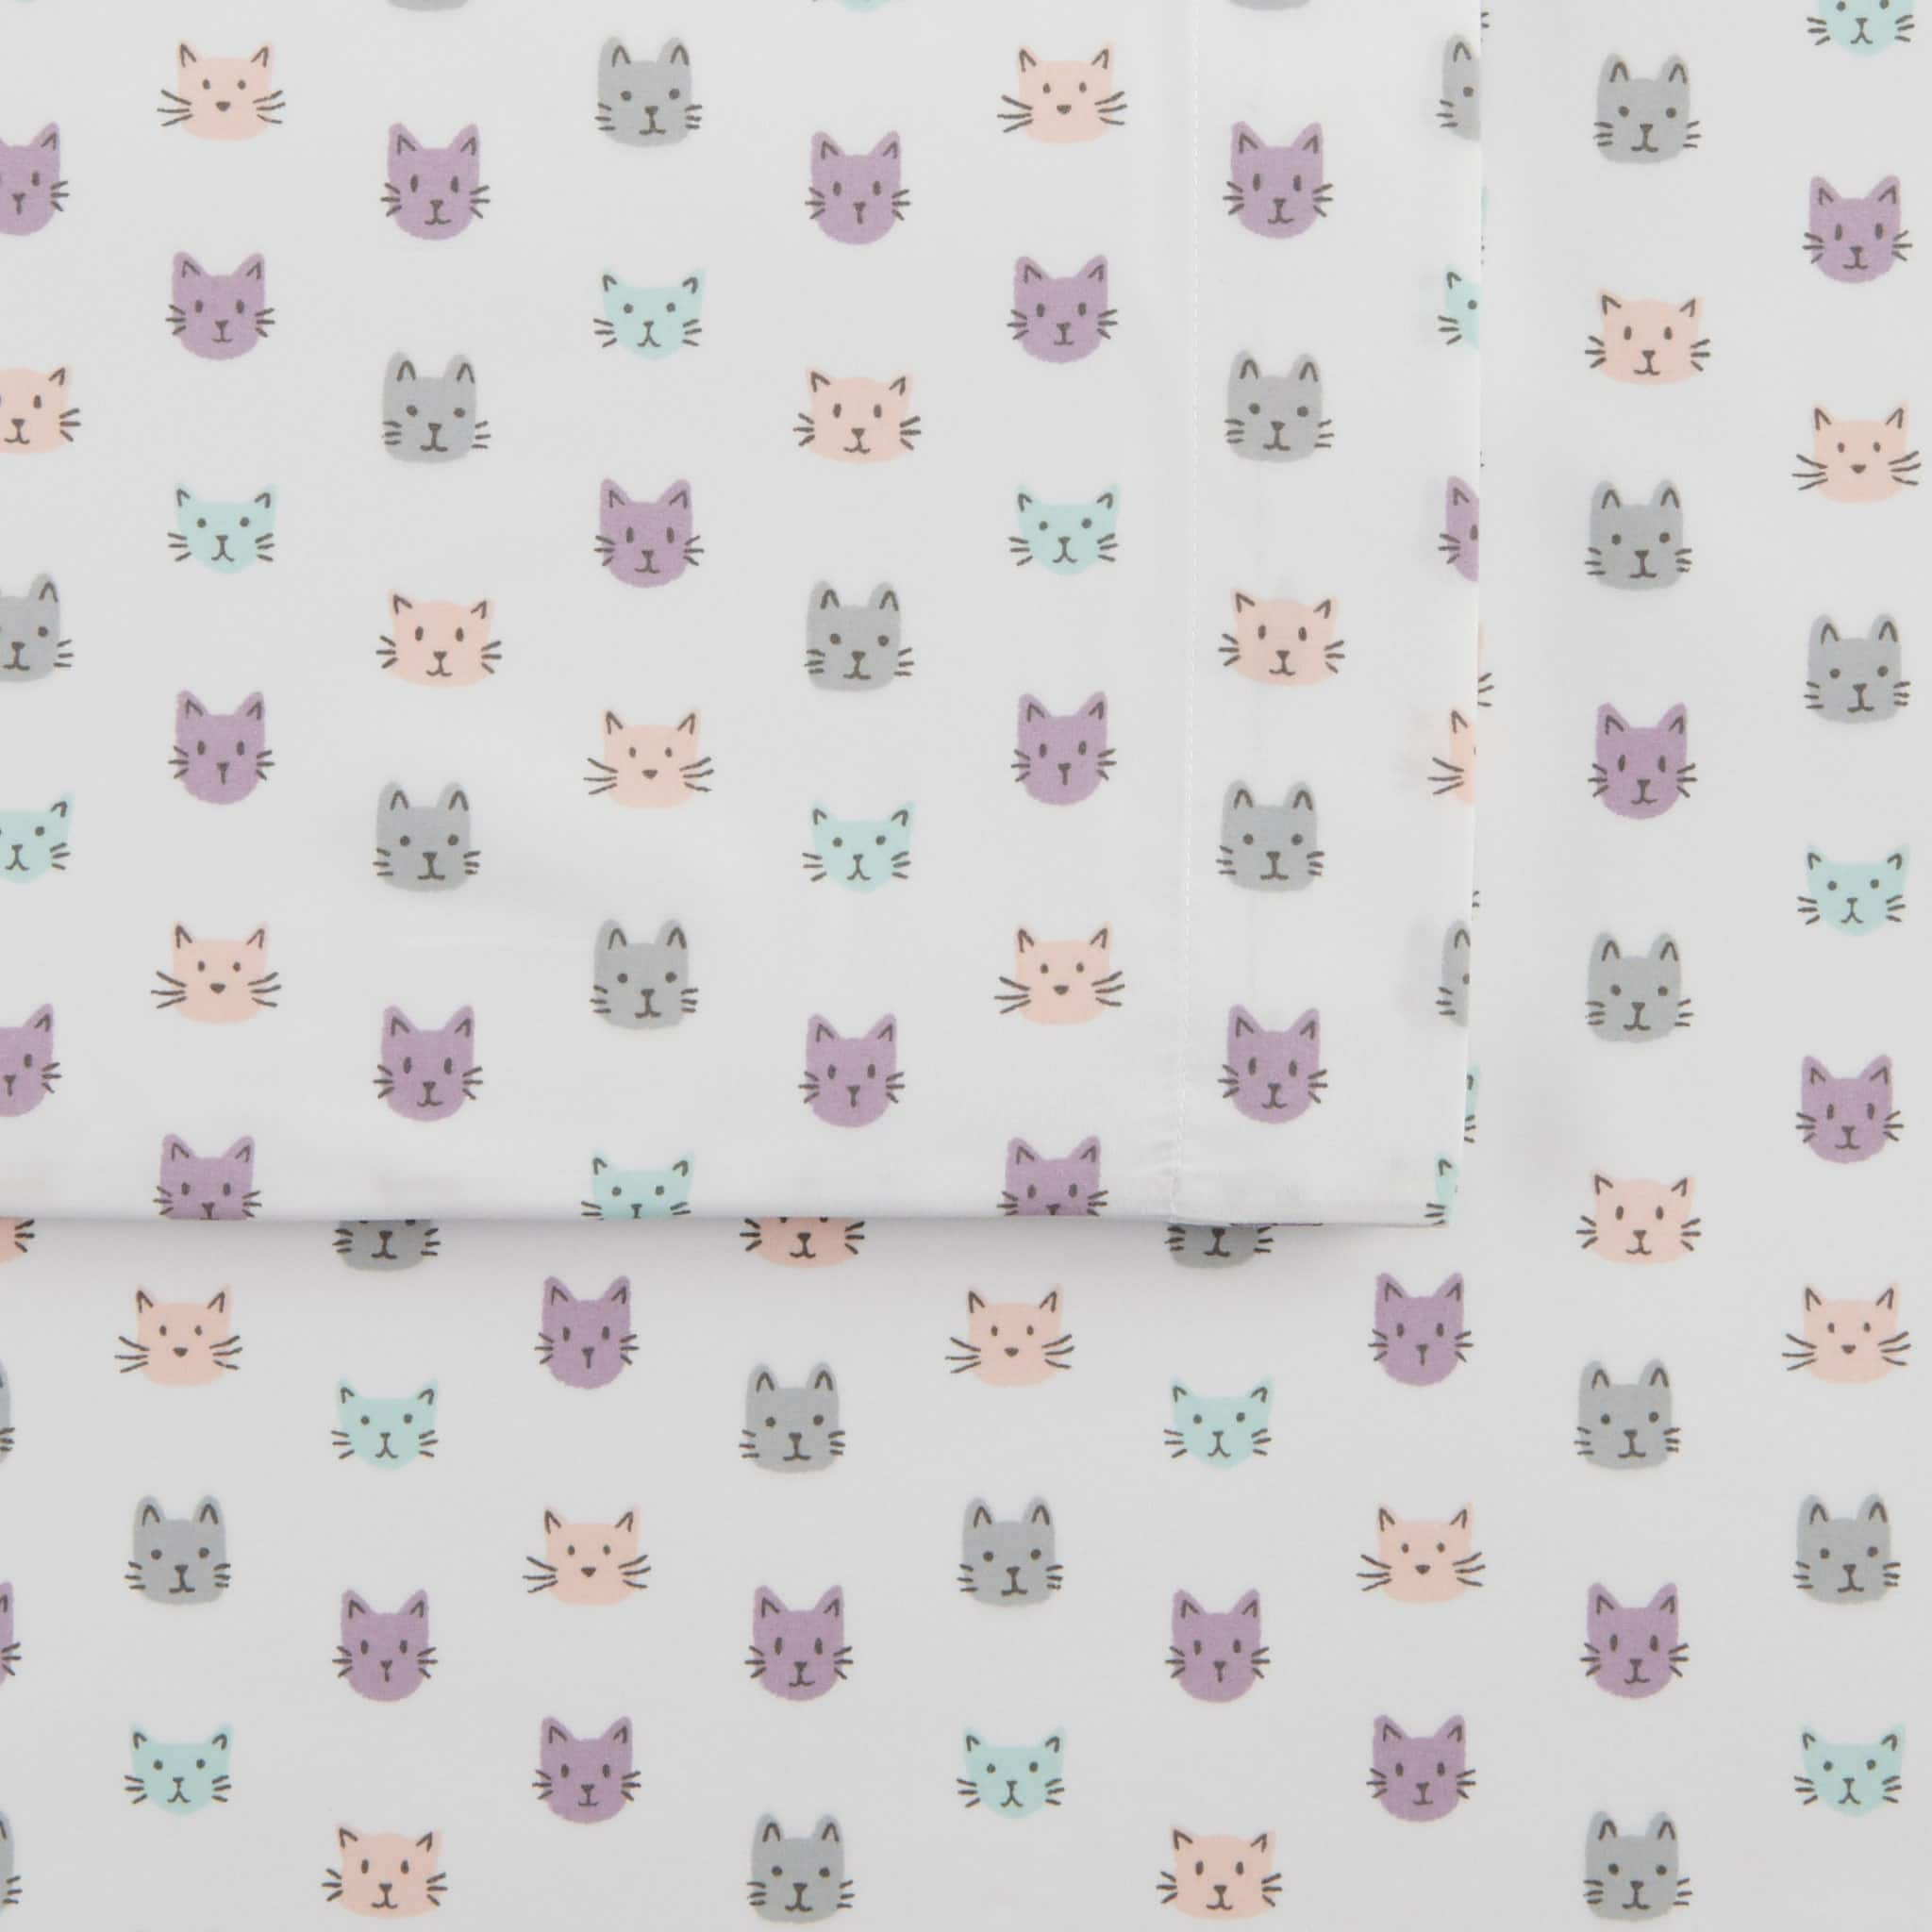 The Big One Twin XL Super Soft Microfiber Sheet Set $8.50 + free store pickup at Kohls